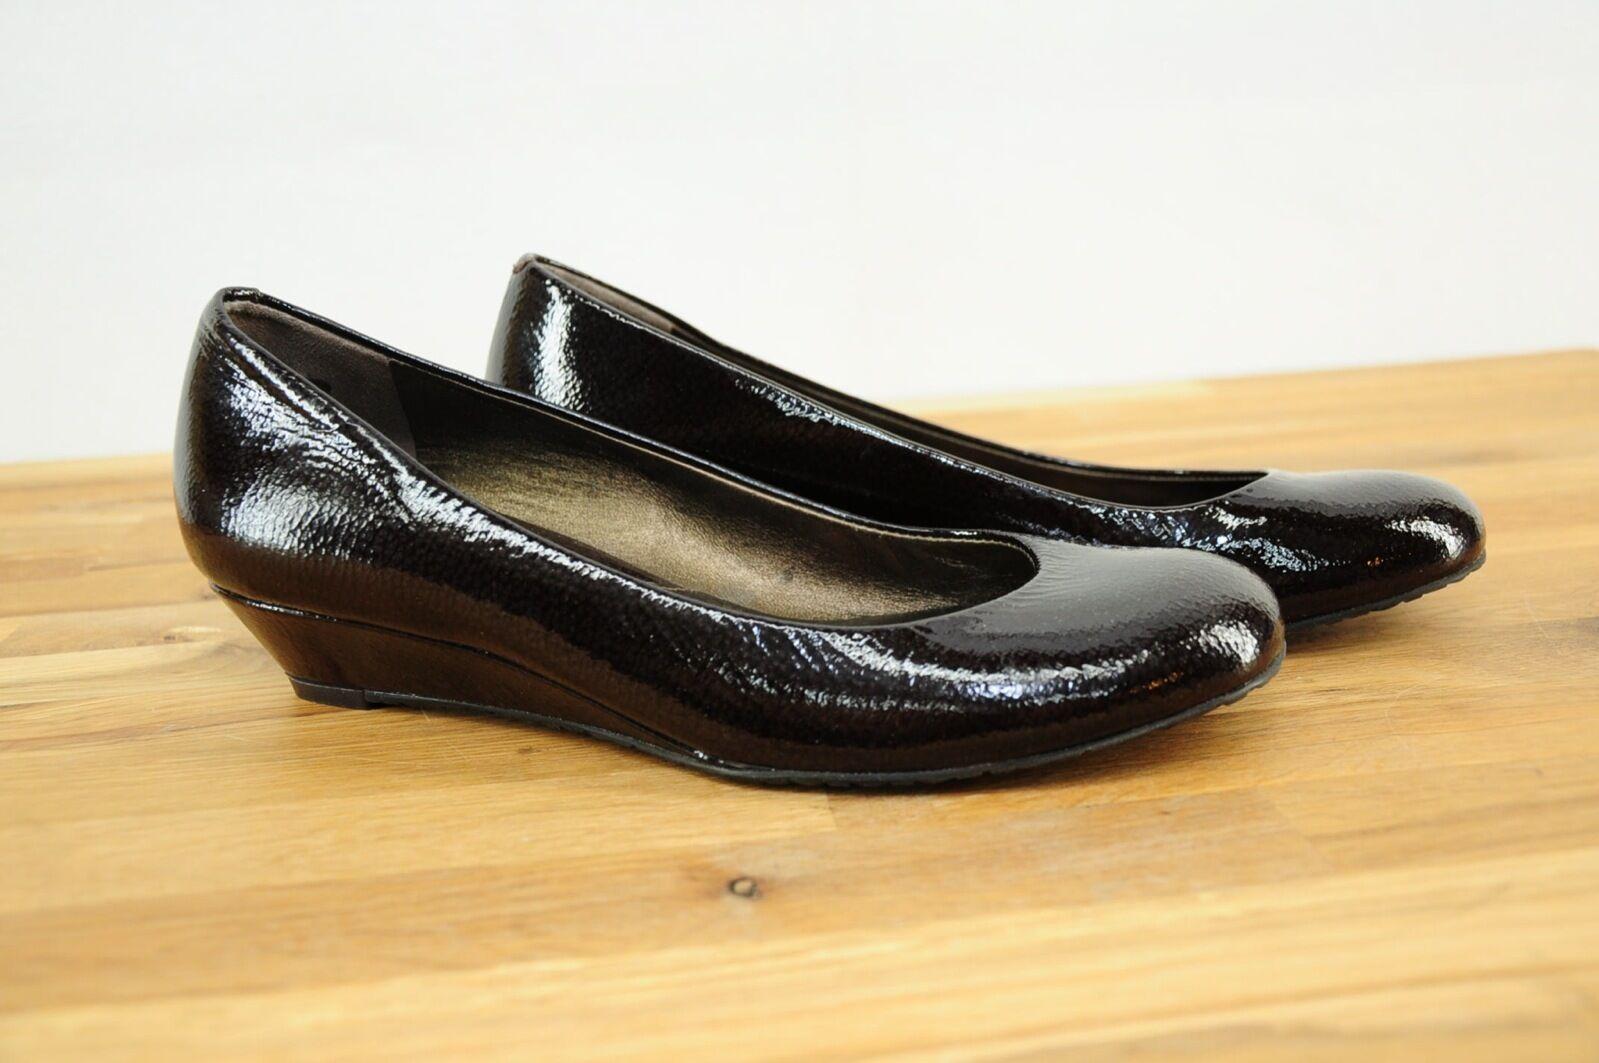 nuovo stile NWOT New Cole Haan nero Marrone Embossed Embossed Embossed Patent Leather Wedge Low Heels scarpe 6B  vendita di fama mondiale online